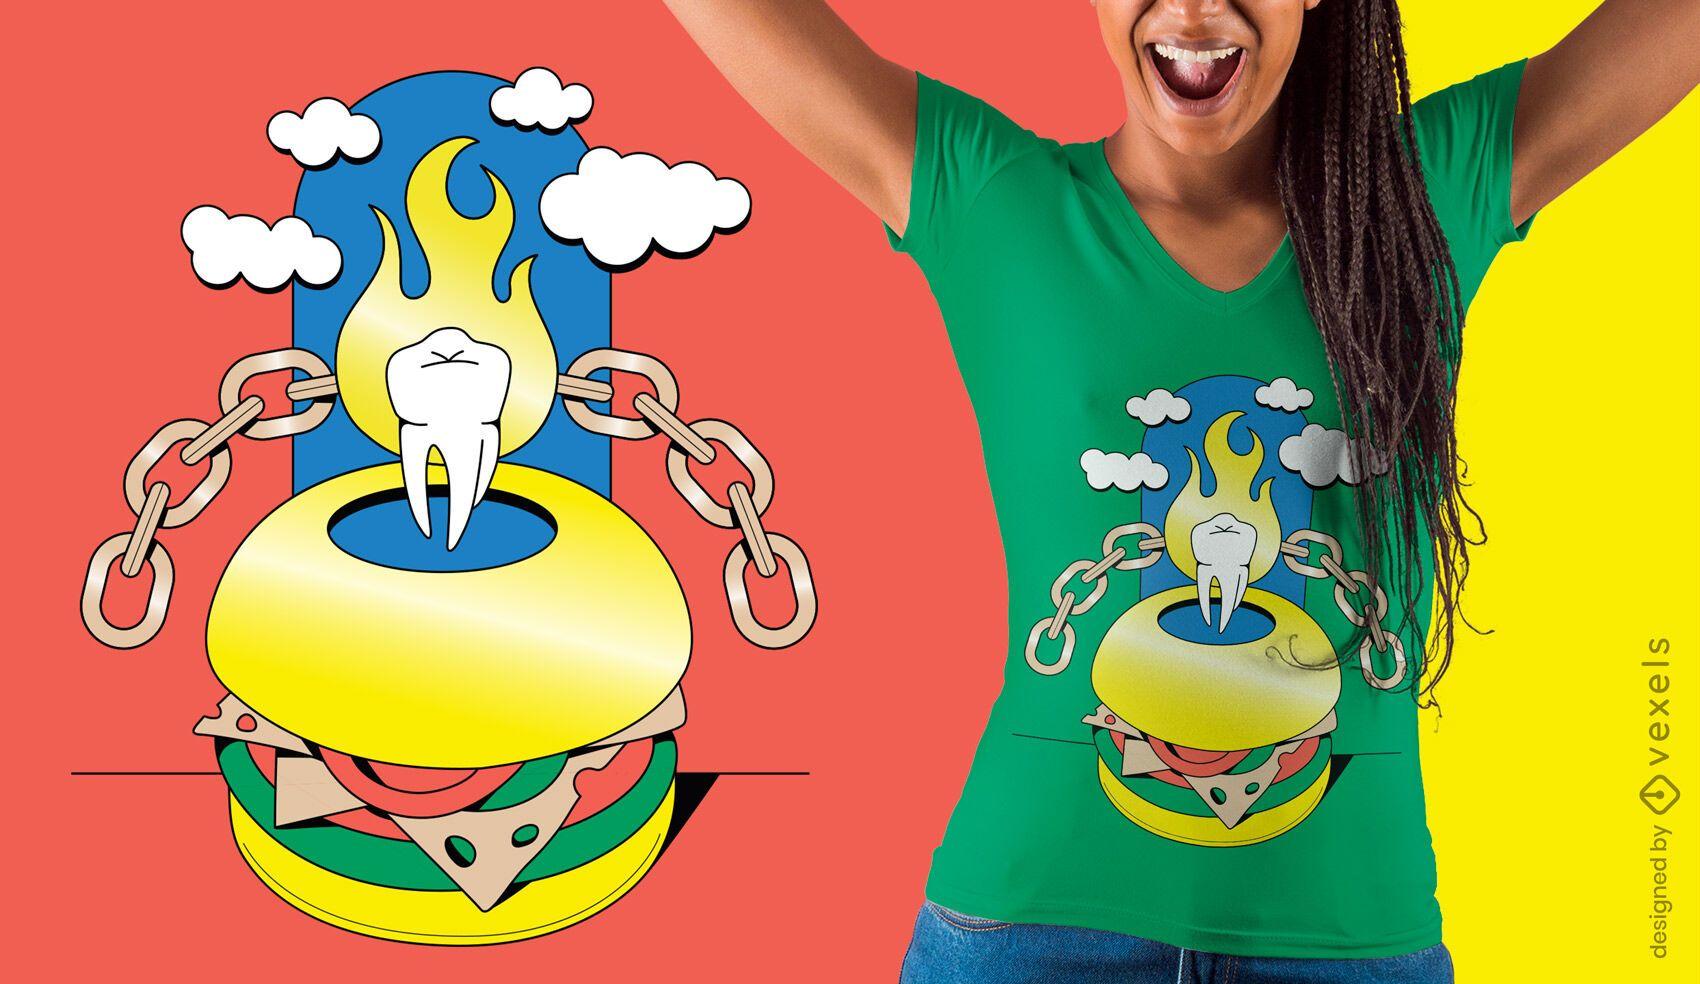 Surreal burger t-shirt design